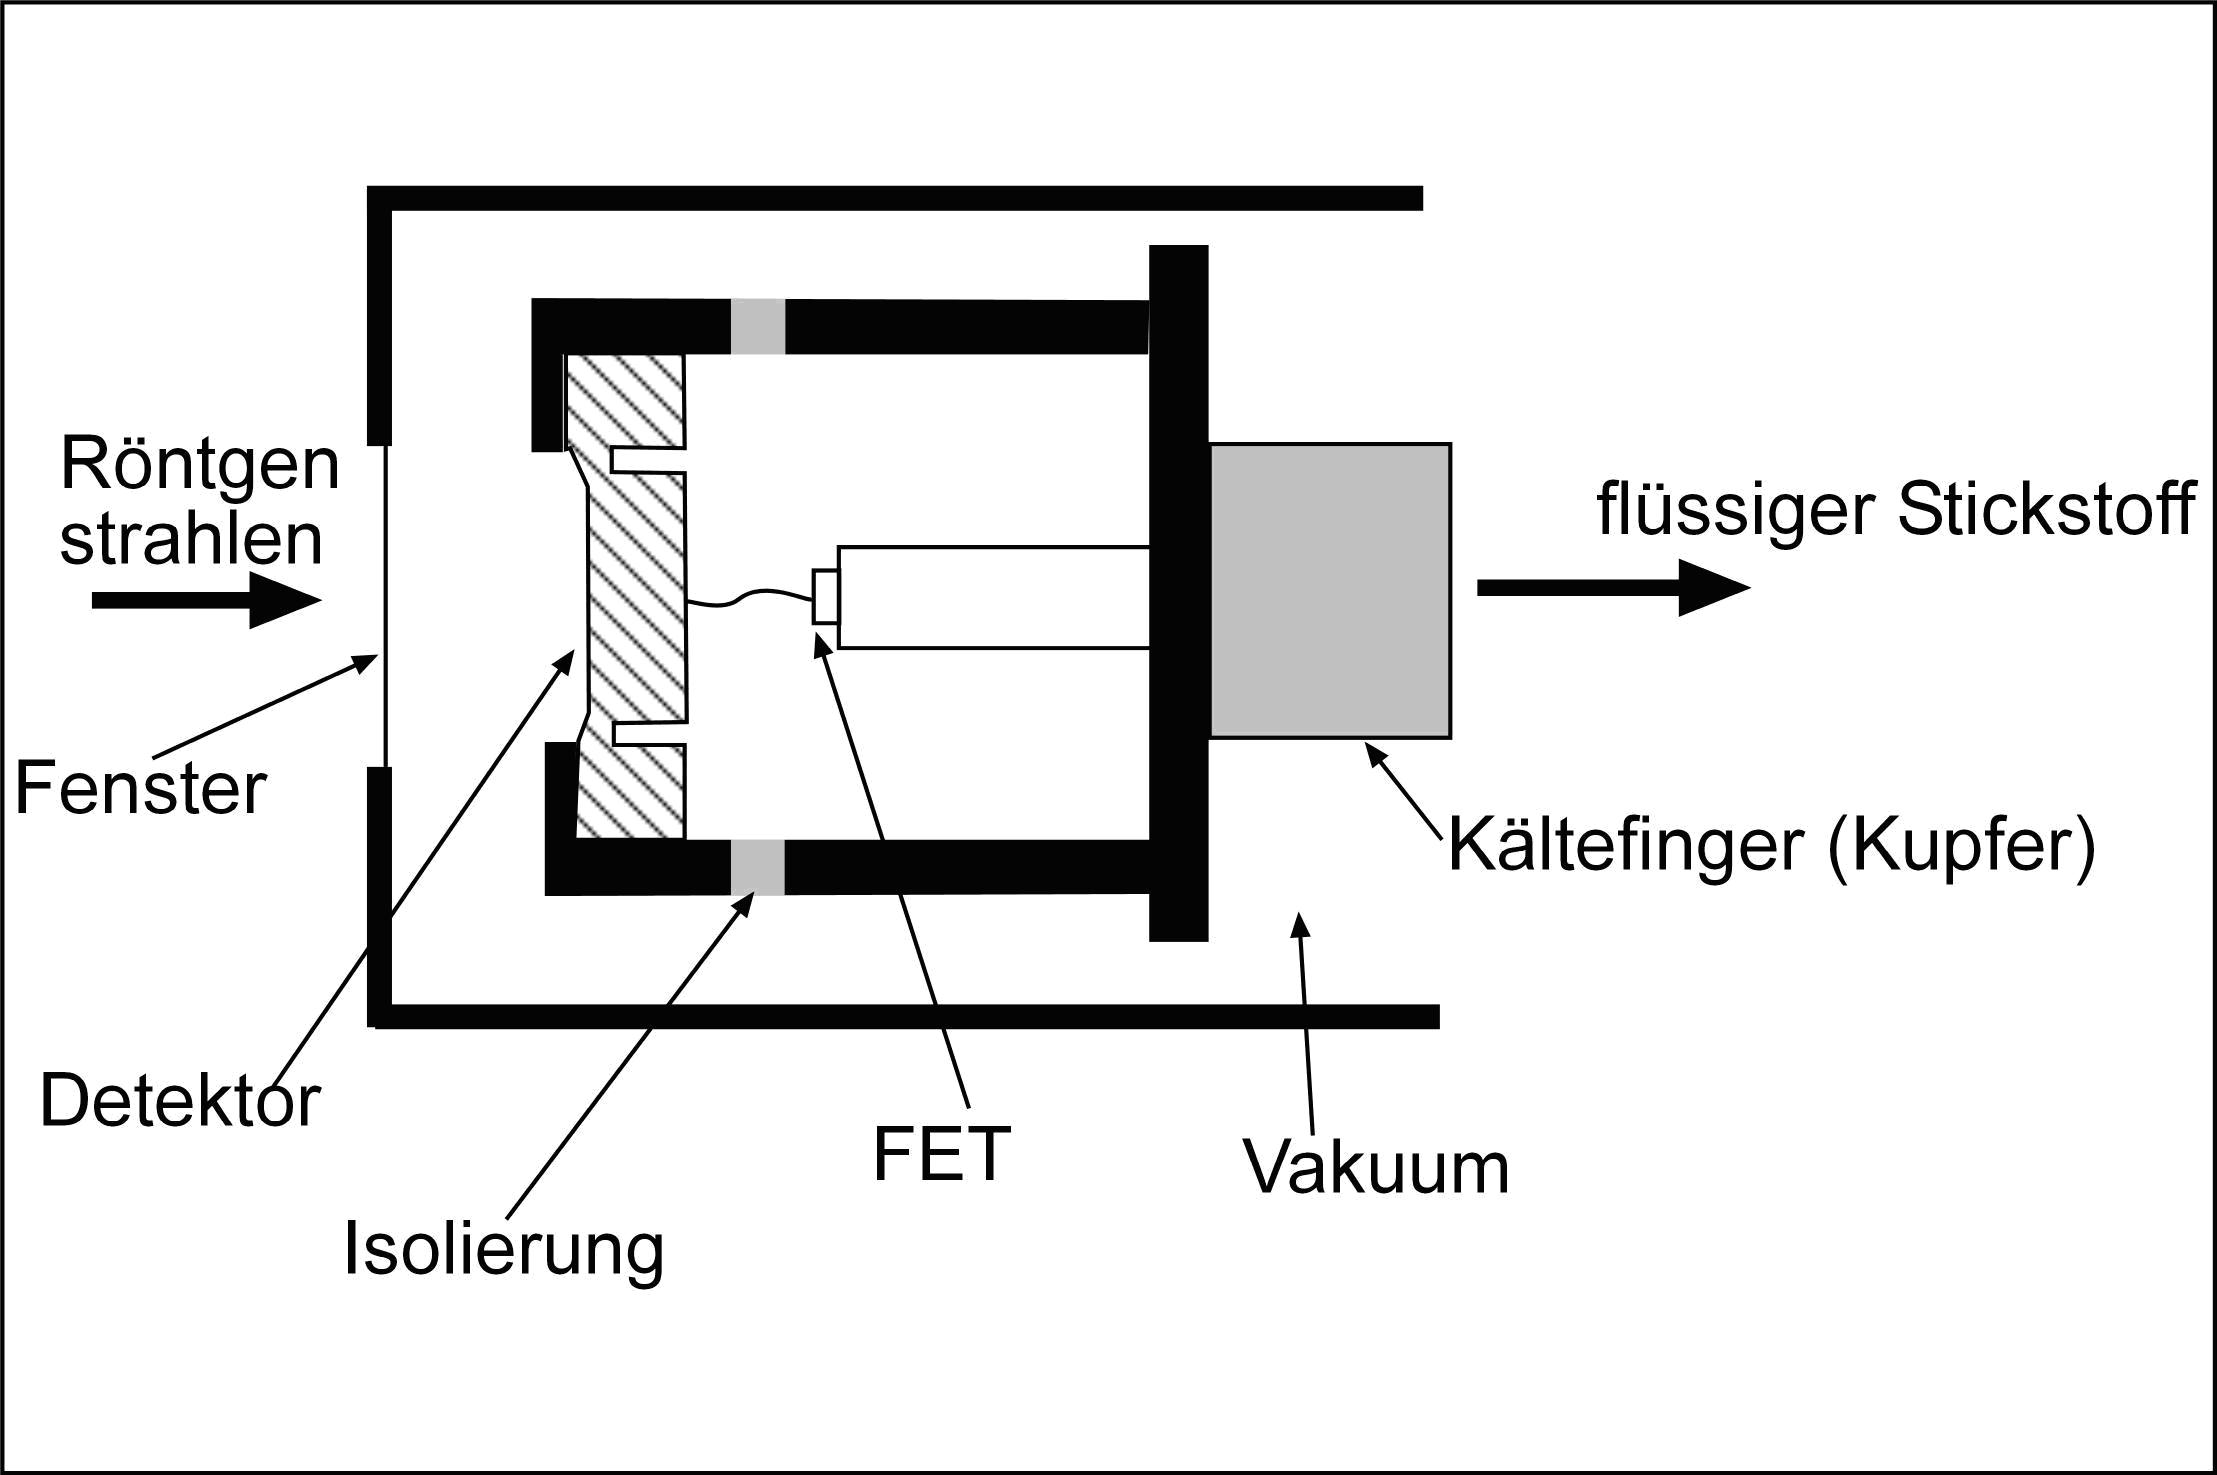 Aufbau eines EDX-Detektors. Modifiziert nach REED (1996)